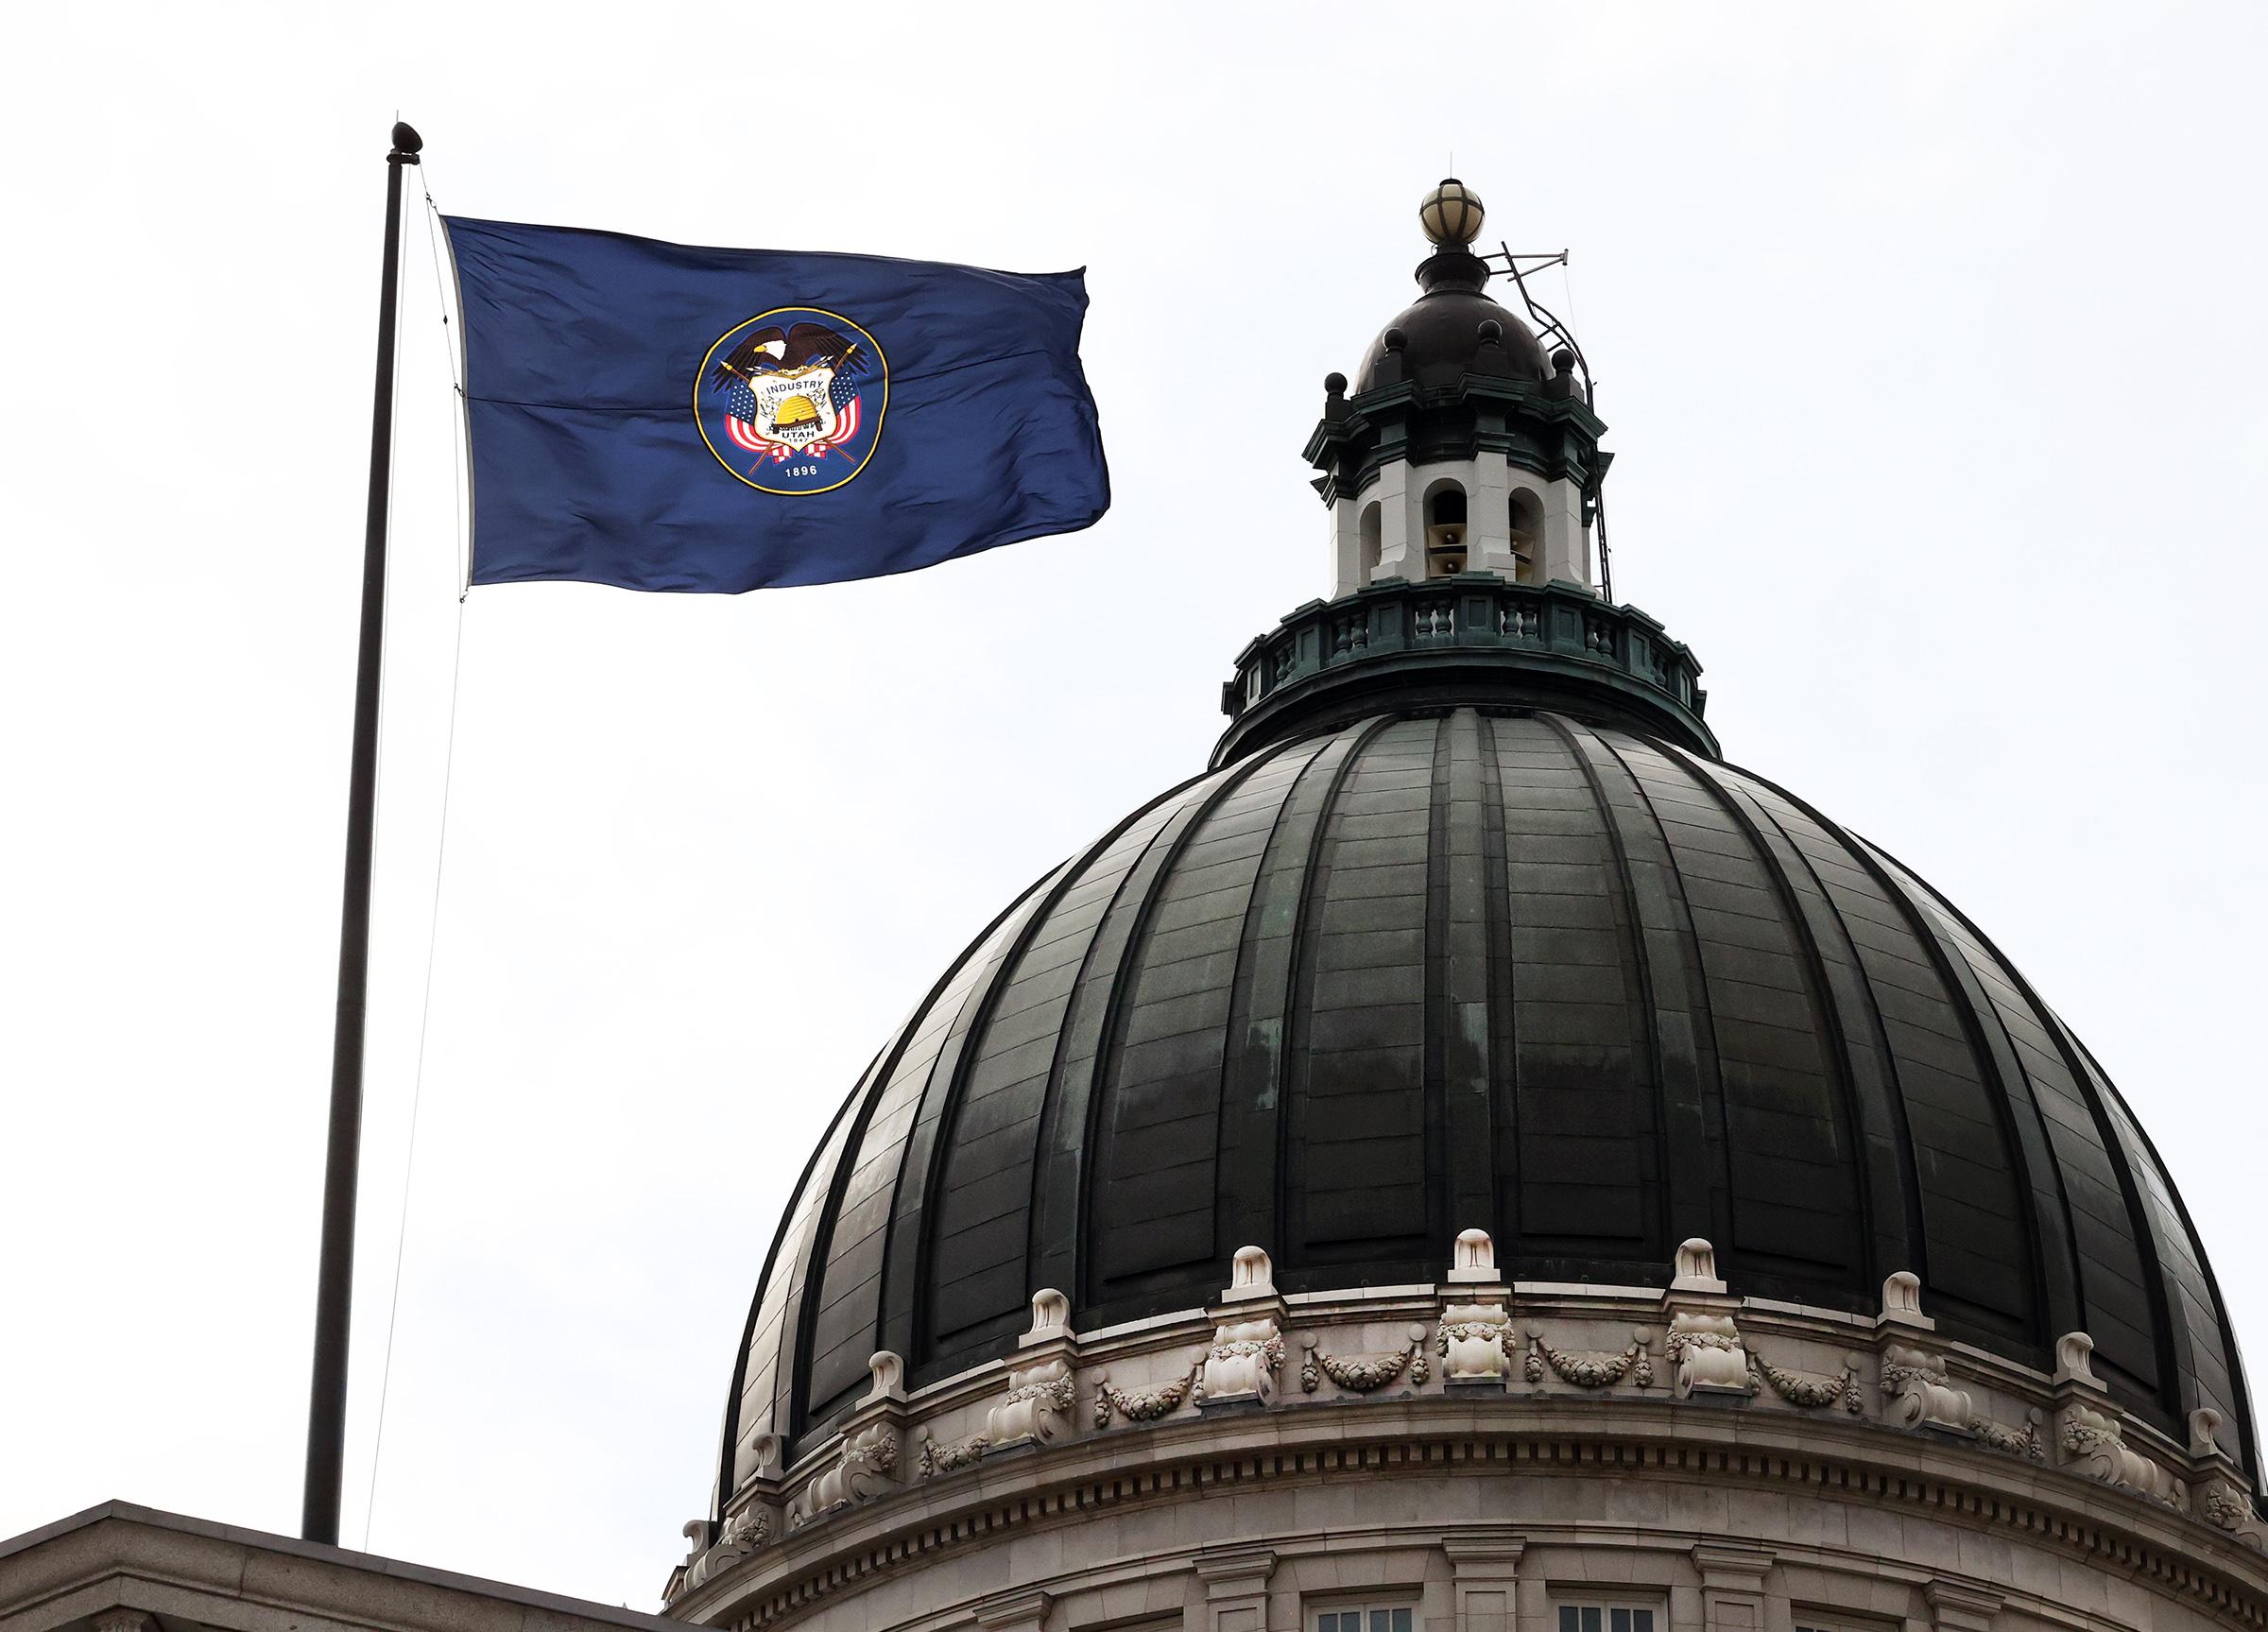 The Utah flag flies over the Capitol in Salt Lake City on Friday, Jan. 22, 2021.